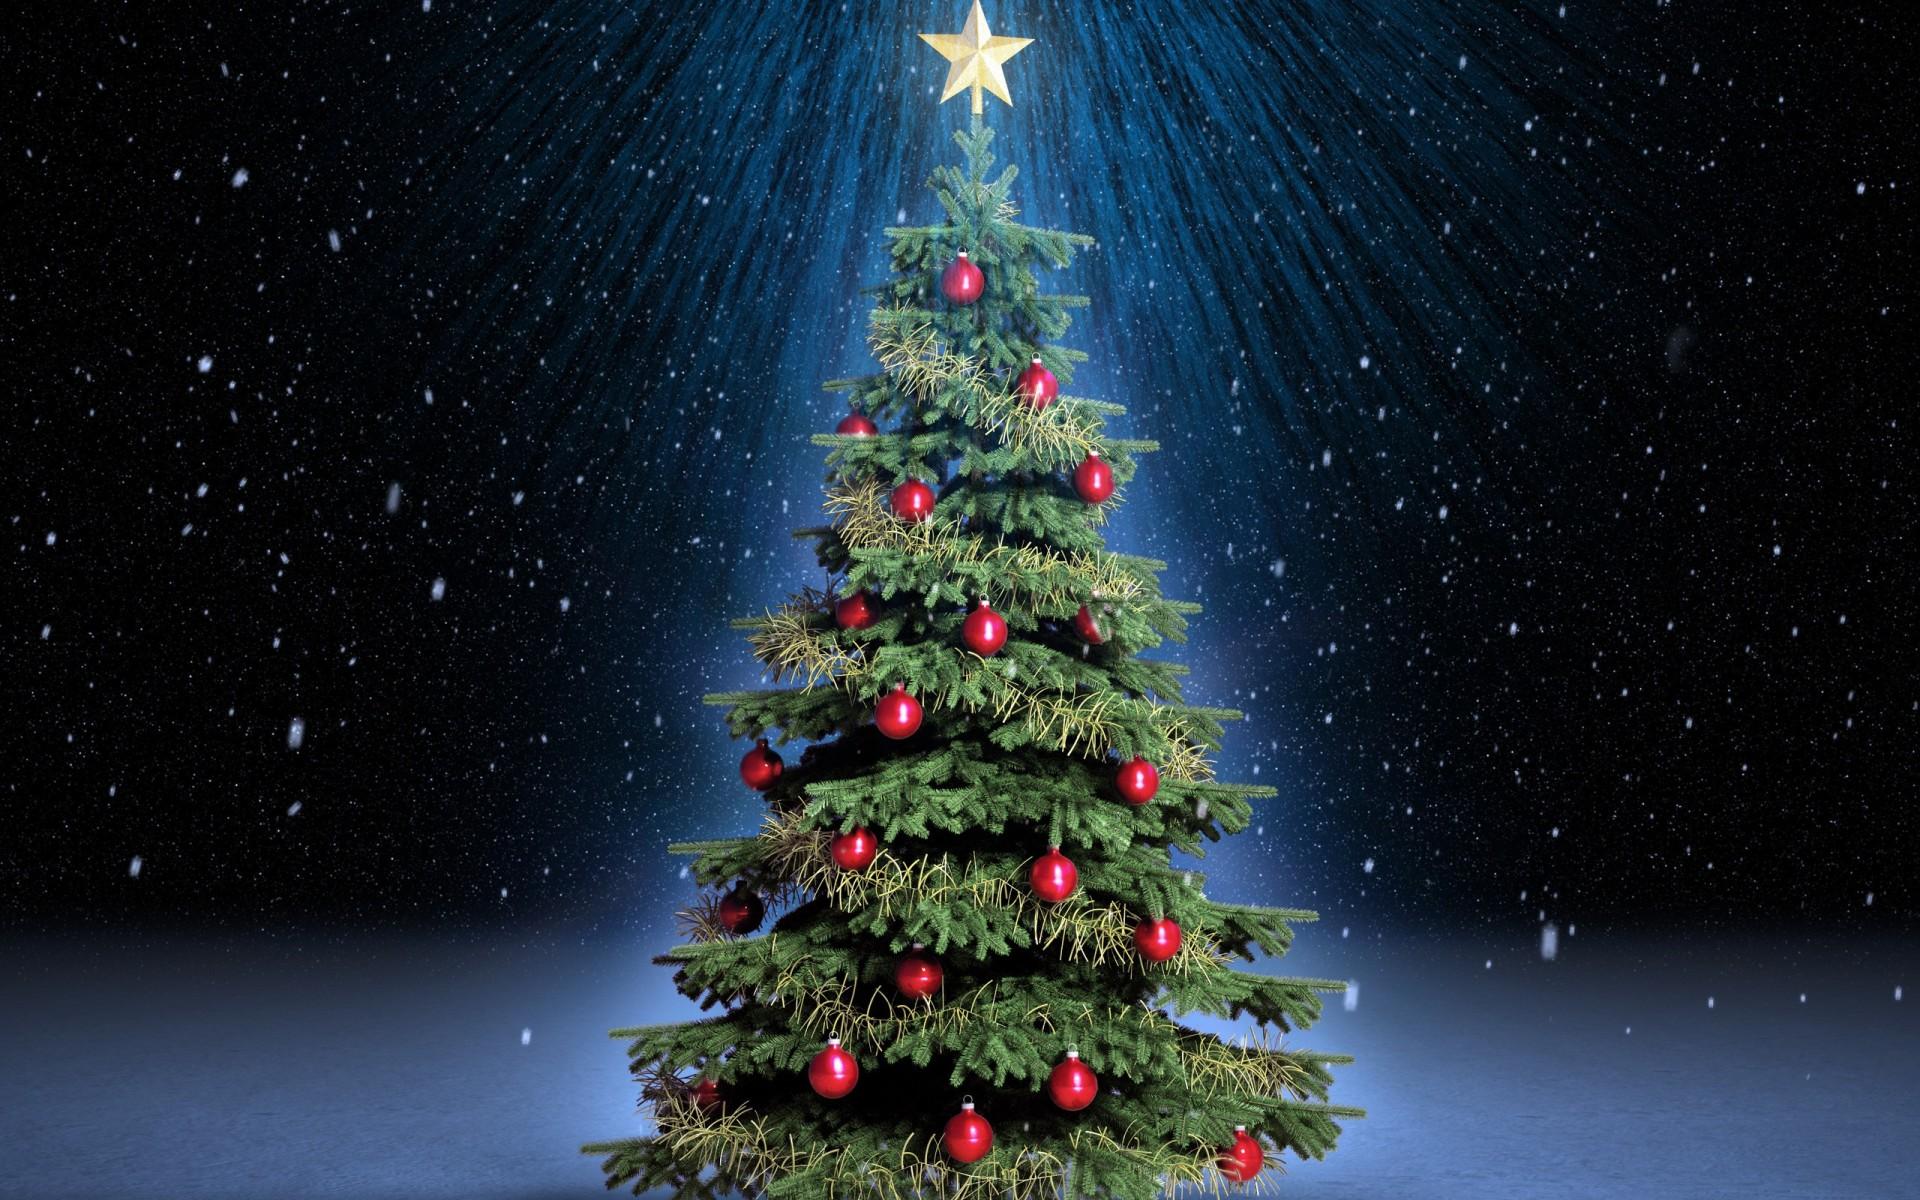 Christmas Tree, Star, Red Balls, Light, Snow widescreen wallpaper